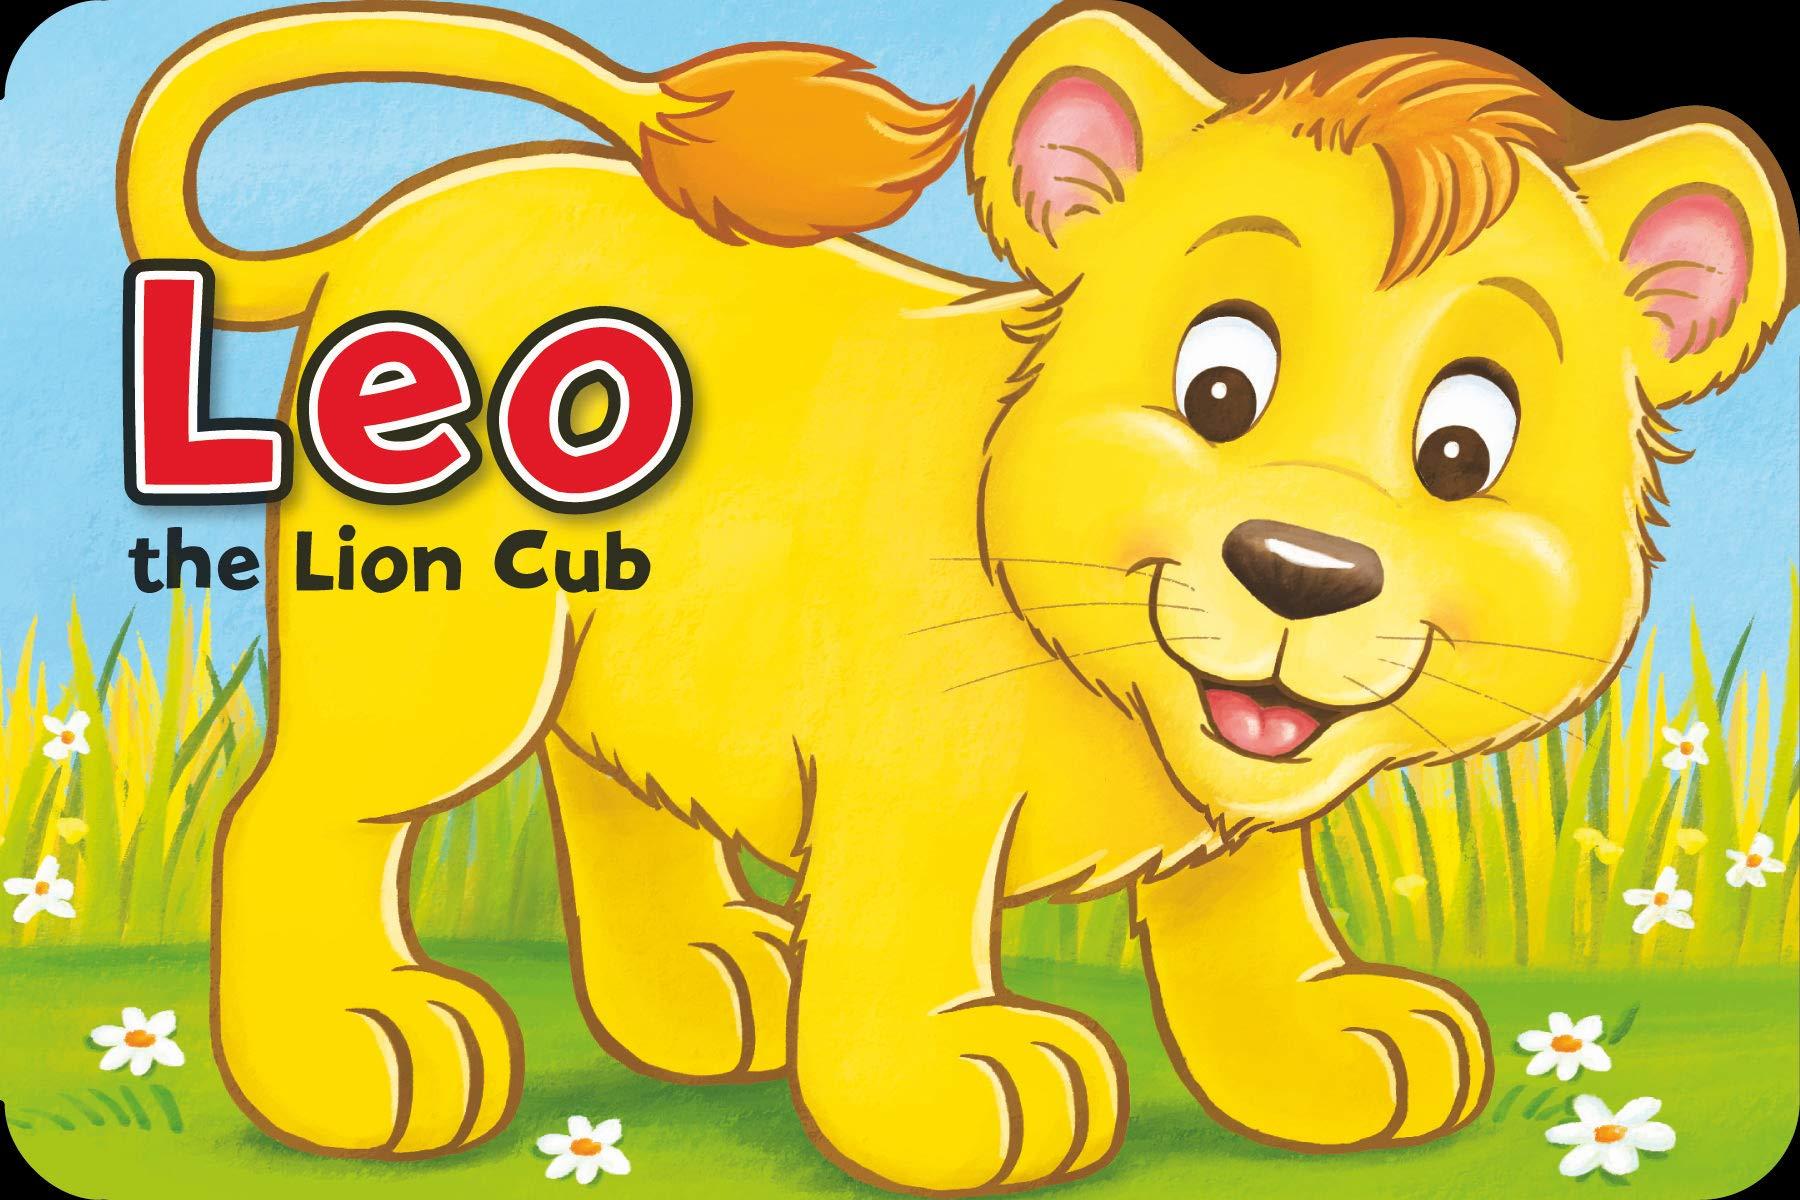 LEO THE LION CUB (PLAYTIME FUN)